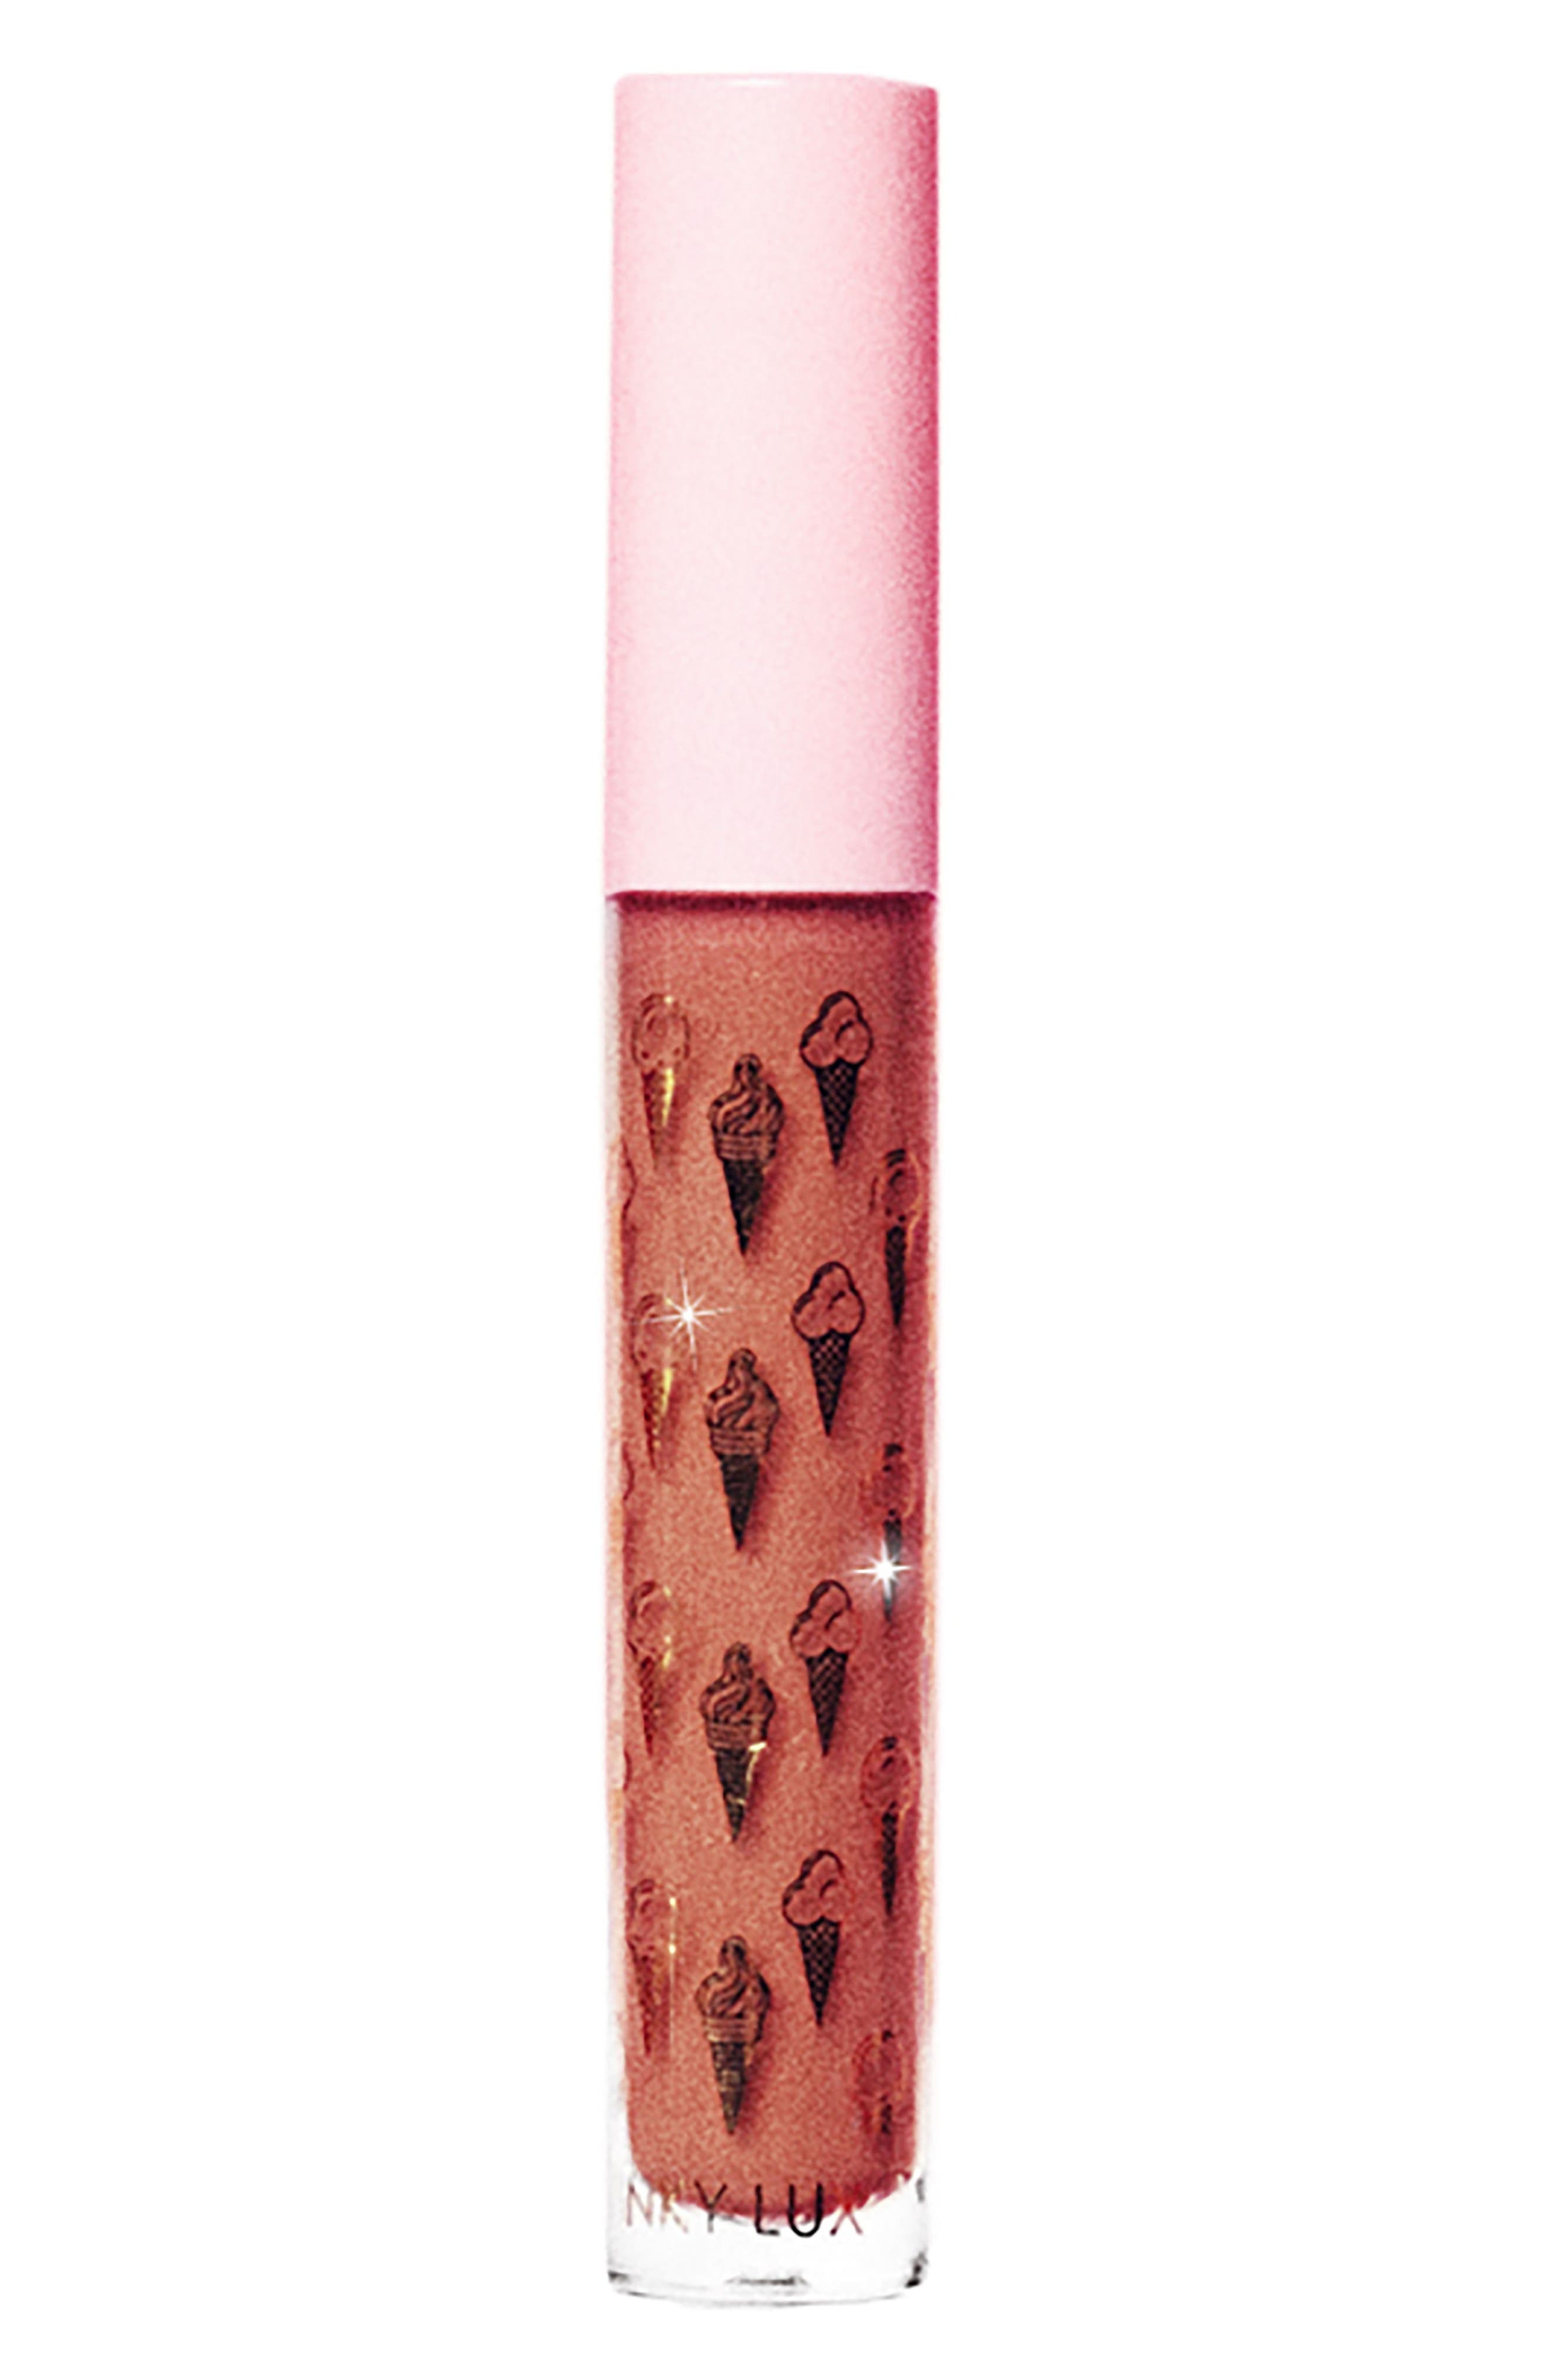 Double Matte Whip Liquid Lipstick,                         Main,                         color, COOKIE